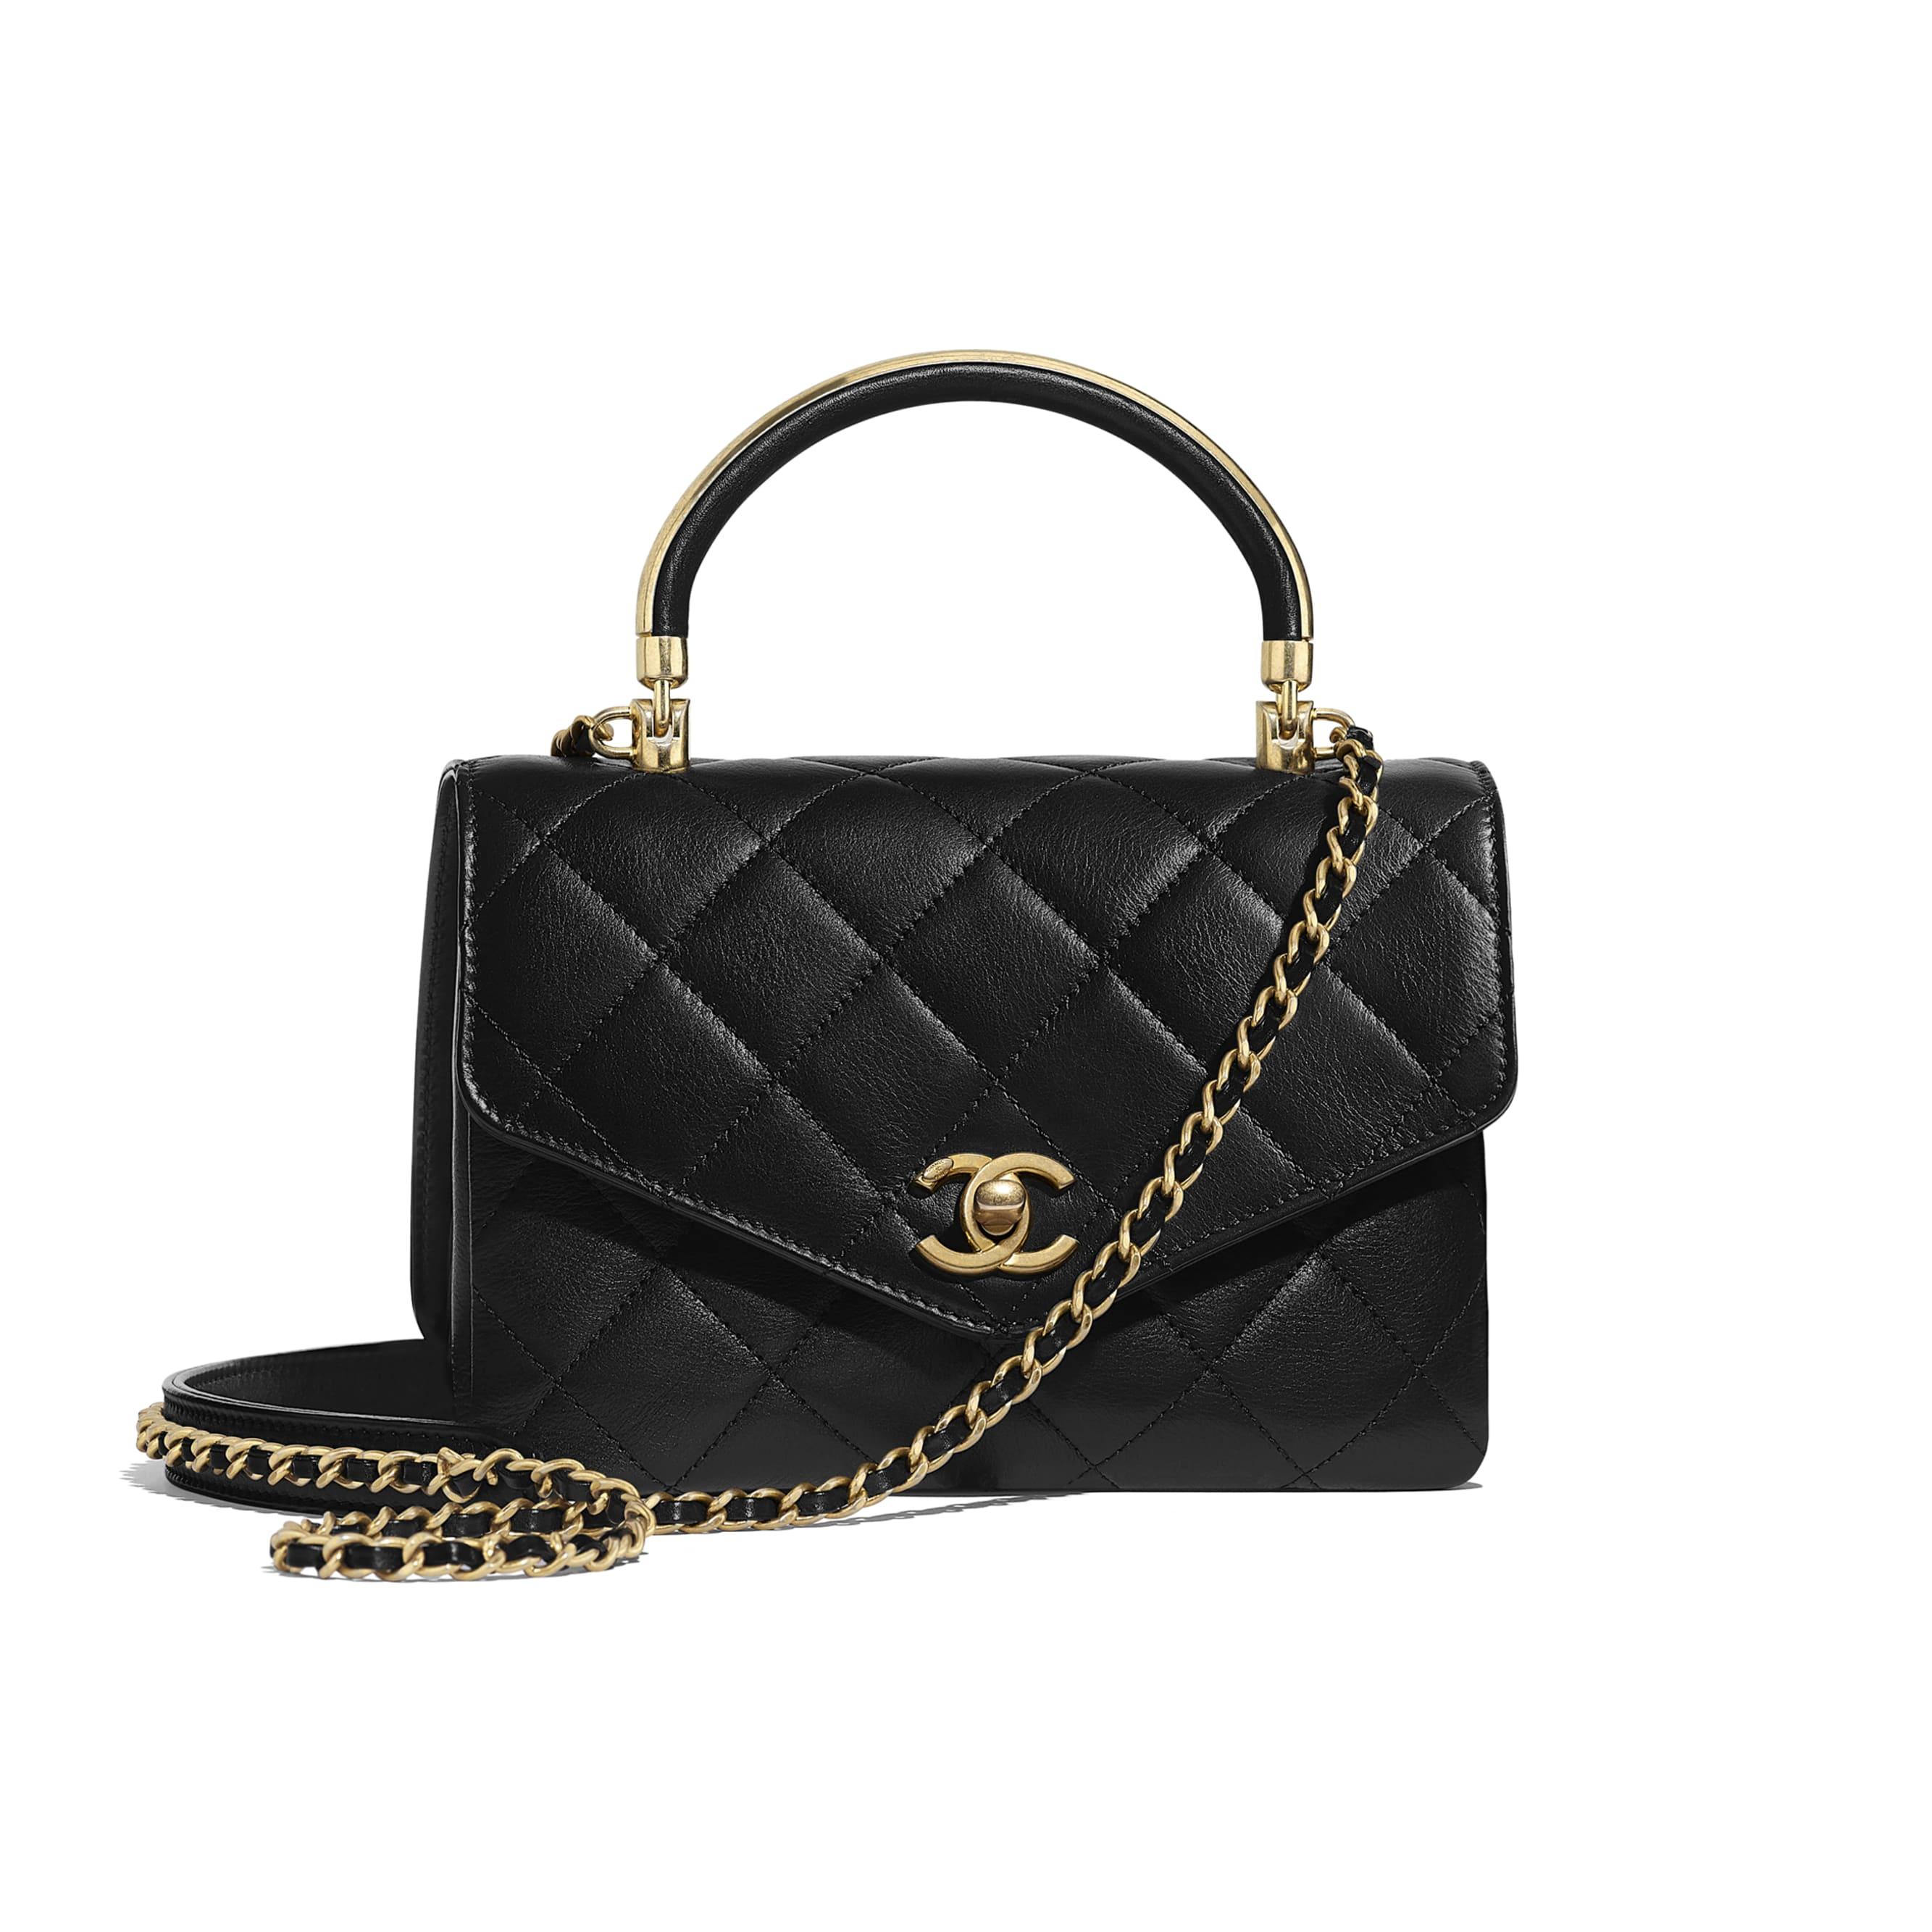 f315ffb14ec3 ... Small Flap Bag with Top Handle - Black - Calfskin   Gold-Tone Metal -